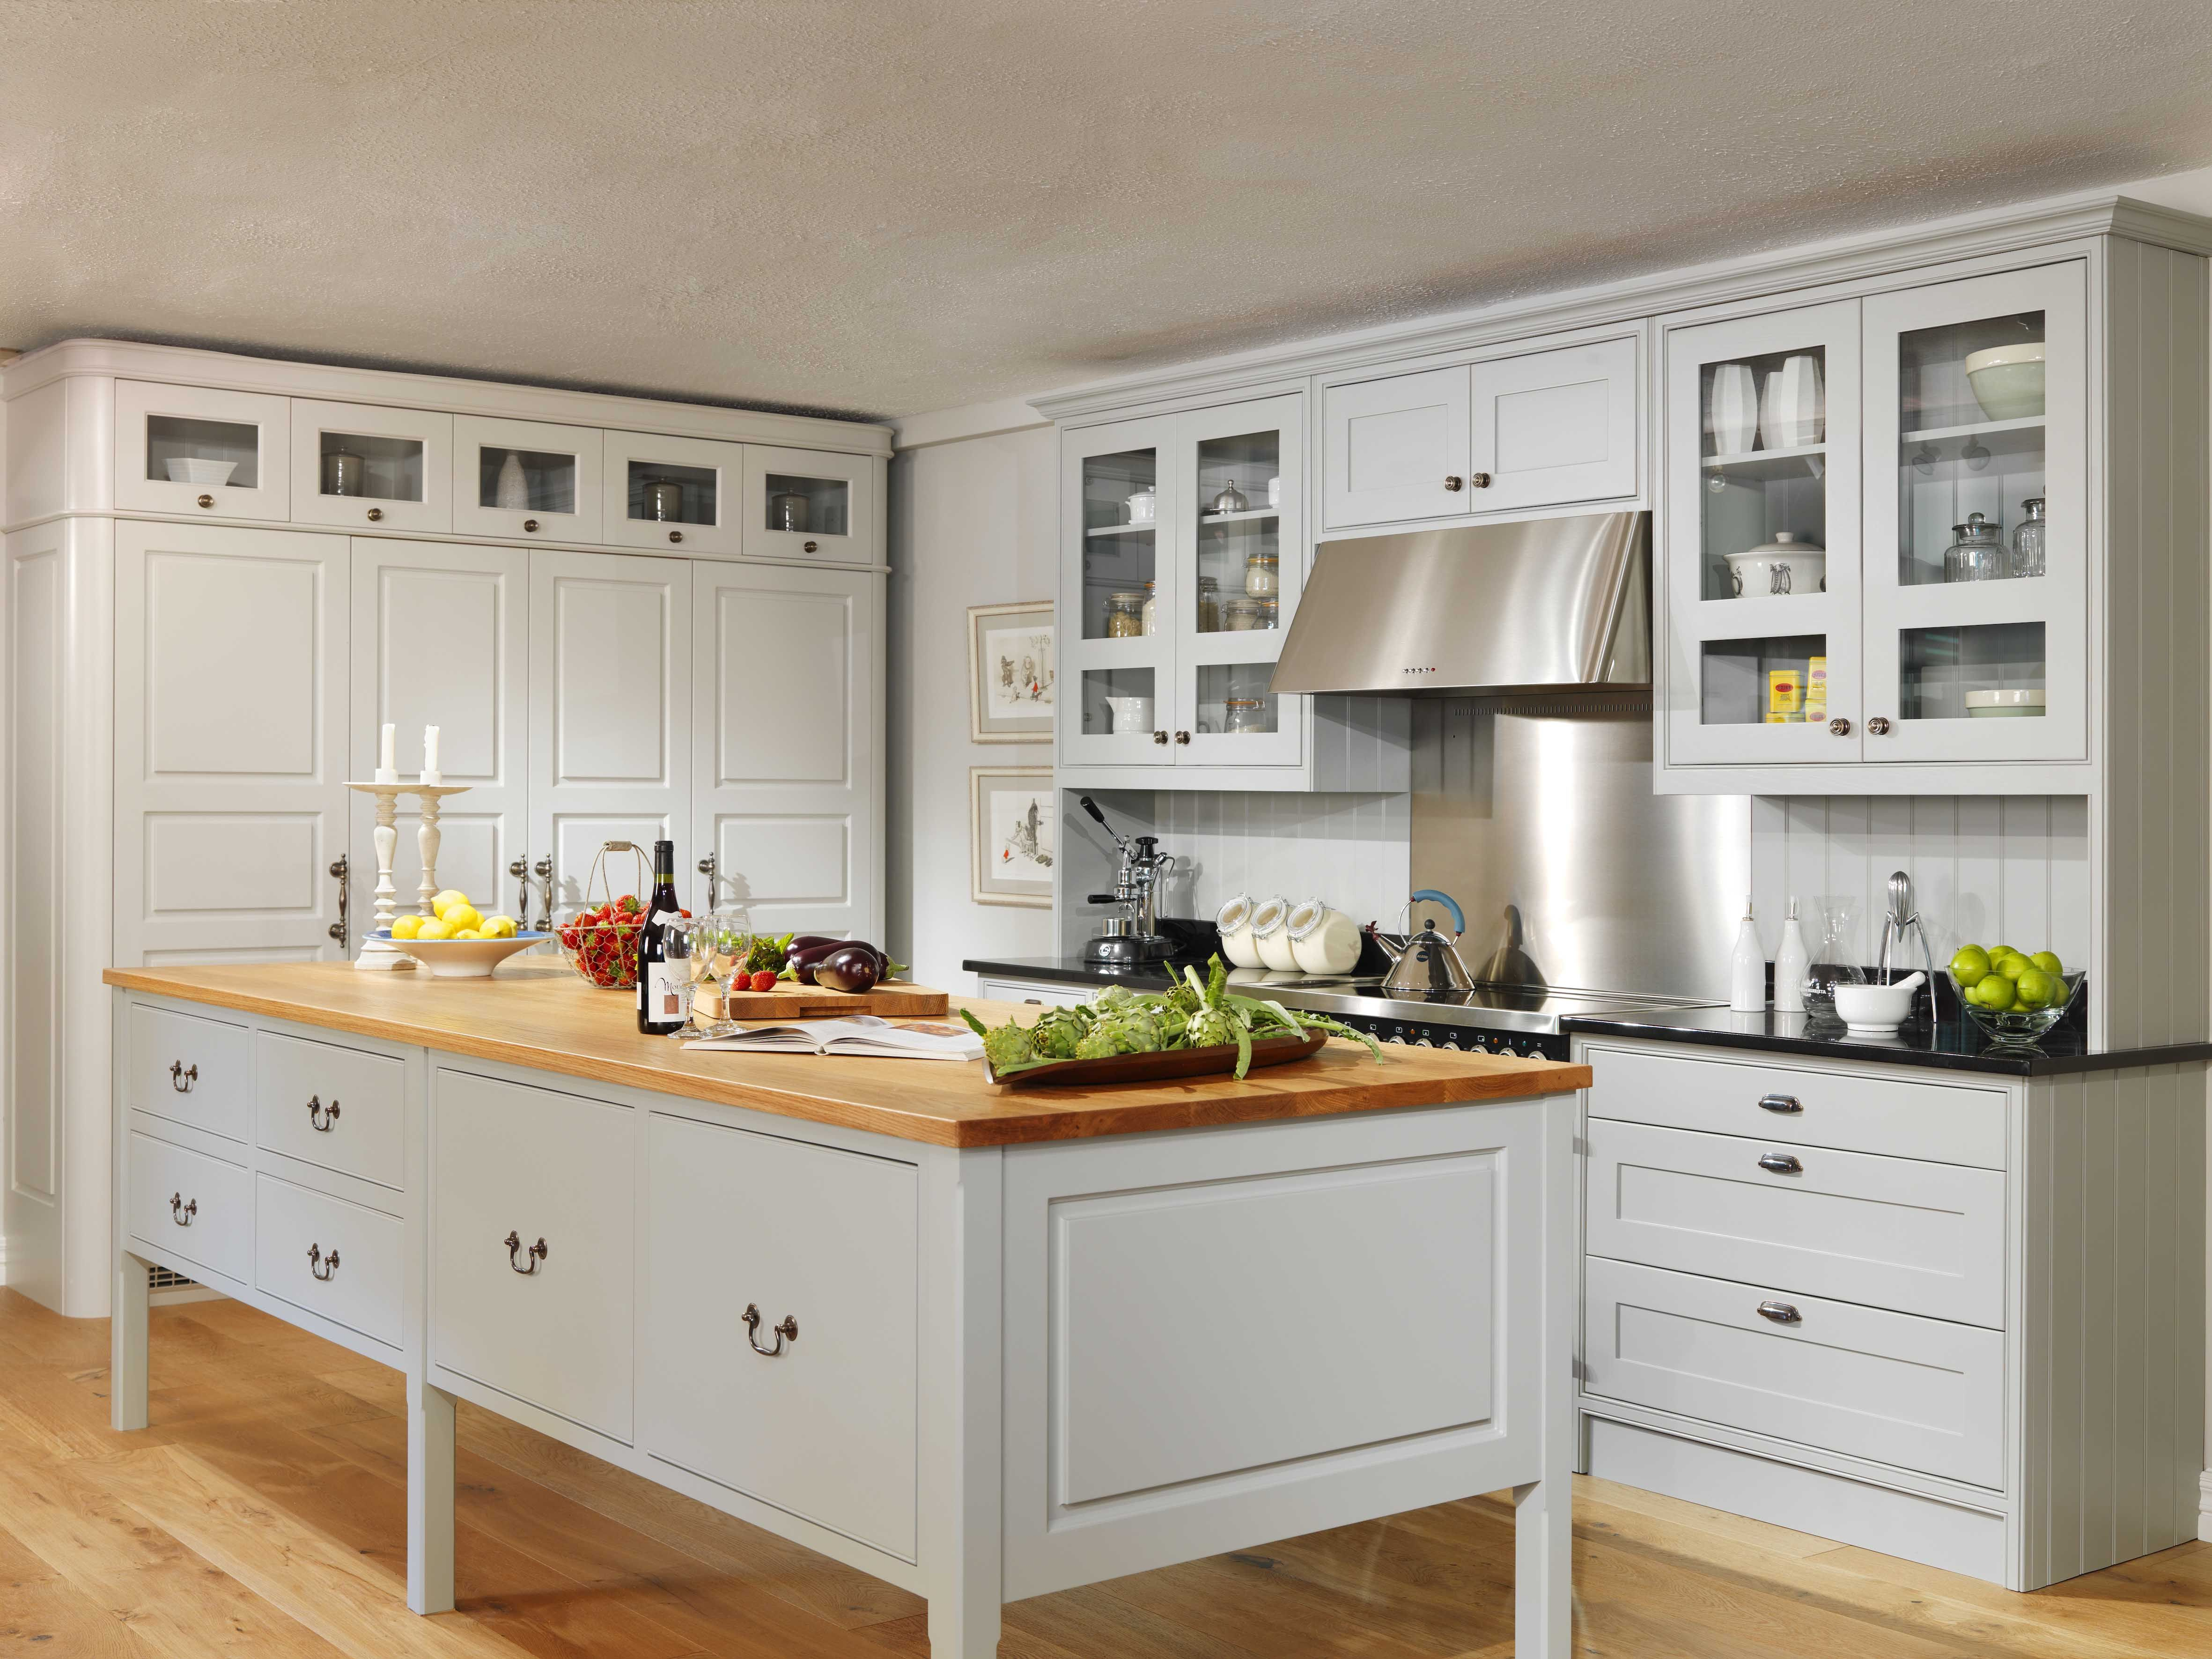 Traditional Kitchen - Traditional Kitchen Island and Oak ... on Traditional Kitchen Wall Decor  id=11307